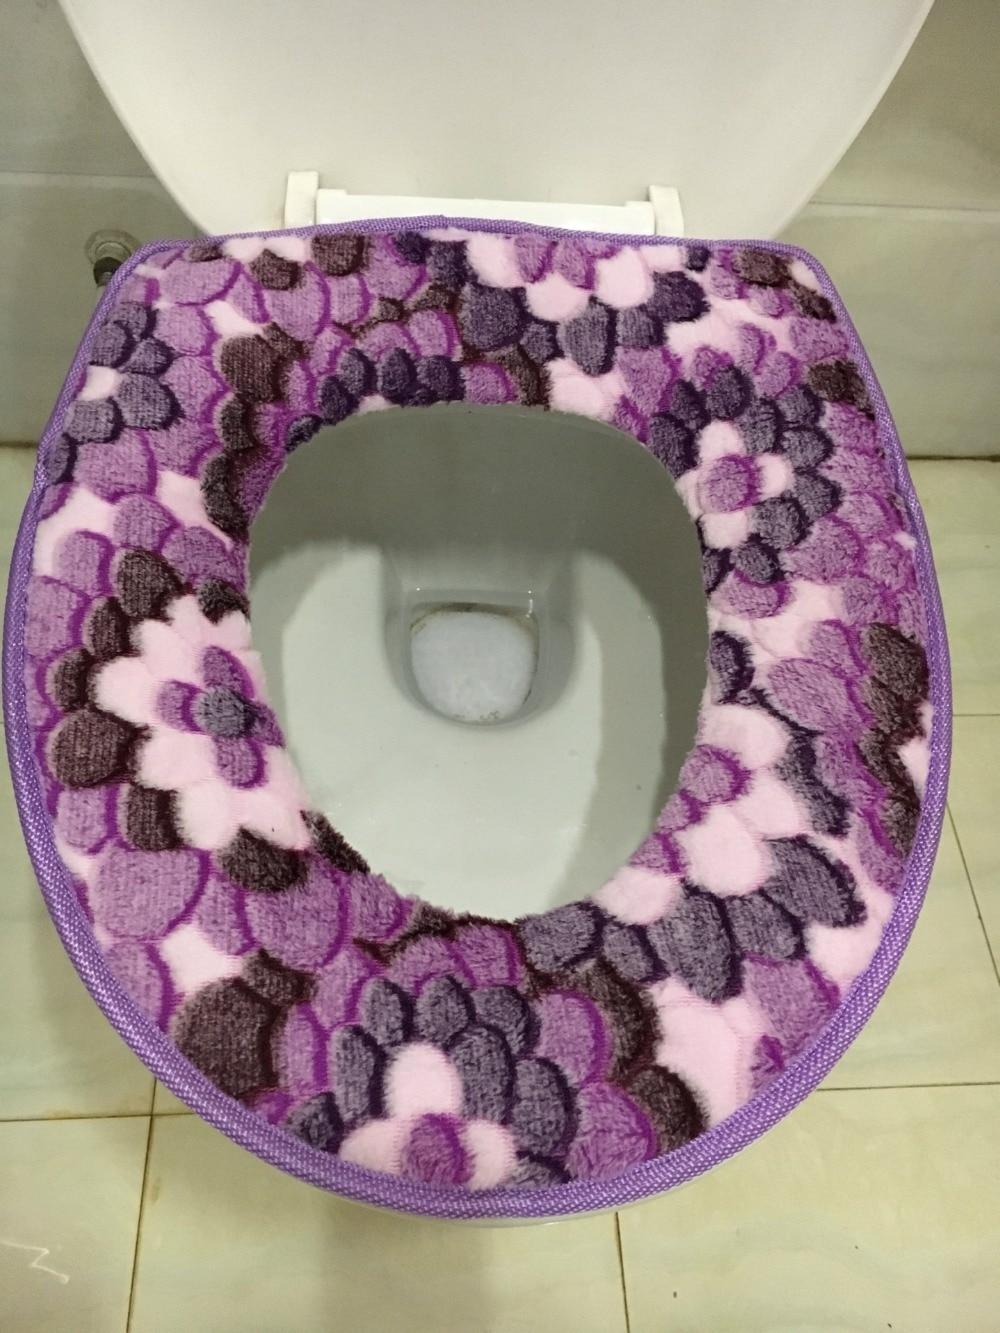 New Top Quality Cotton Linter Overcoat Toilet Case Bathroom Multi - Household Merchandises - Photo 2